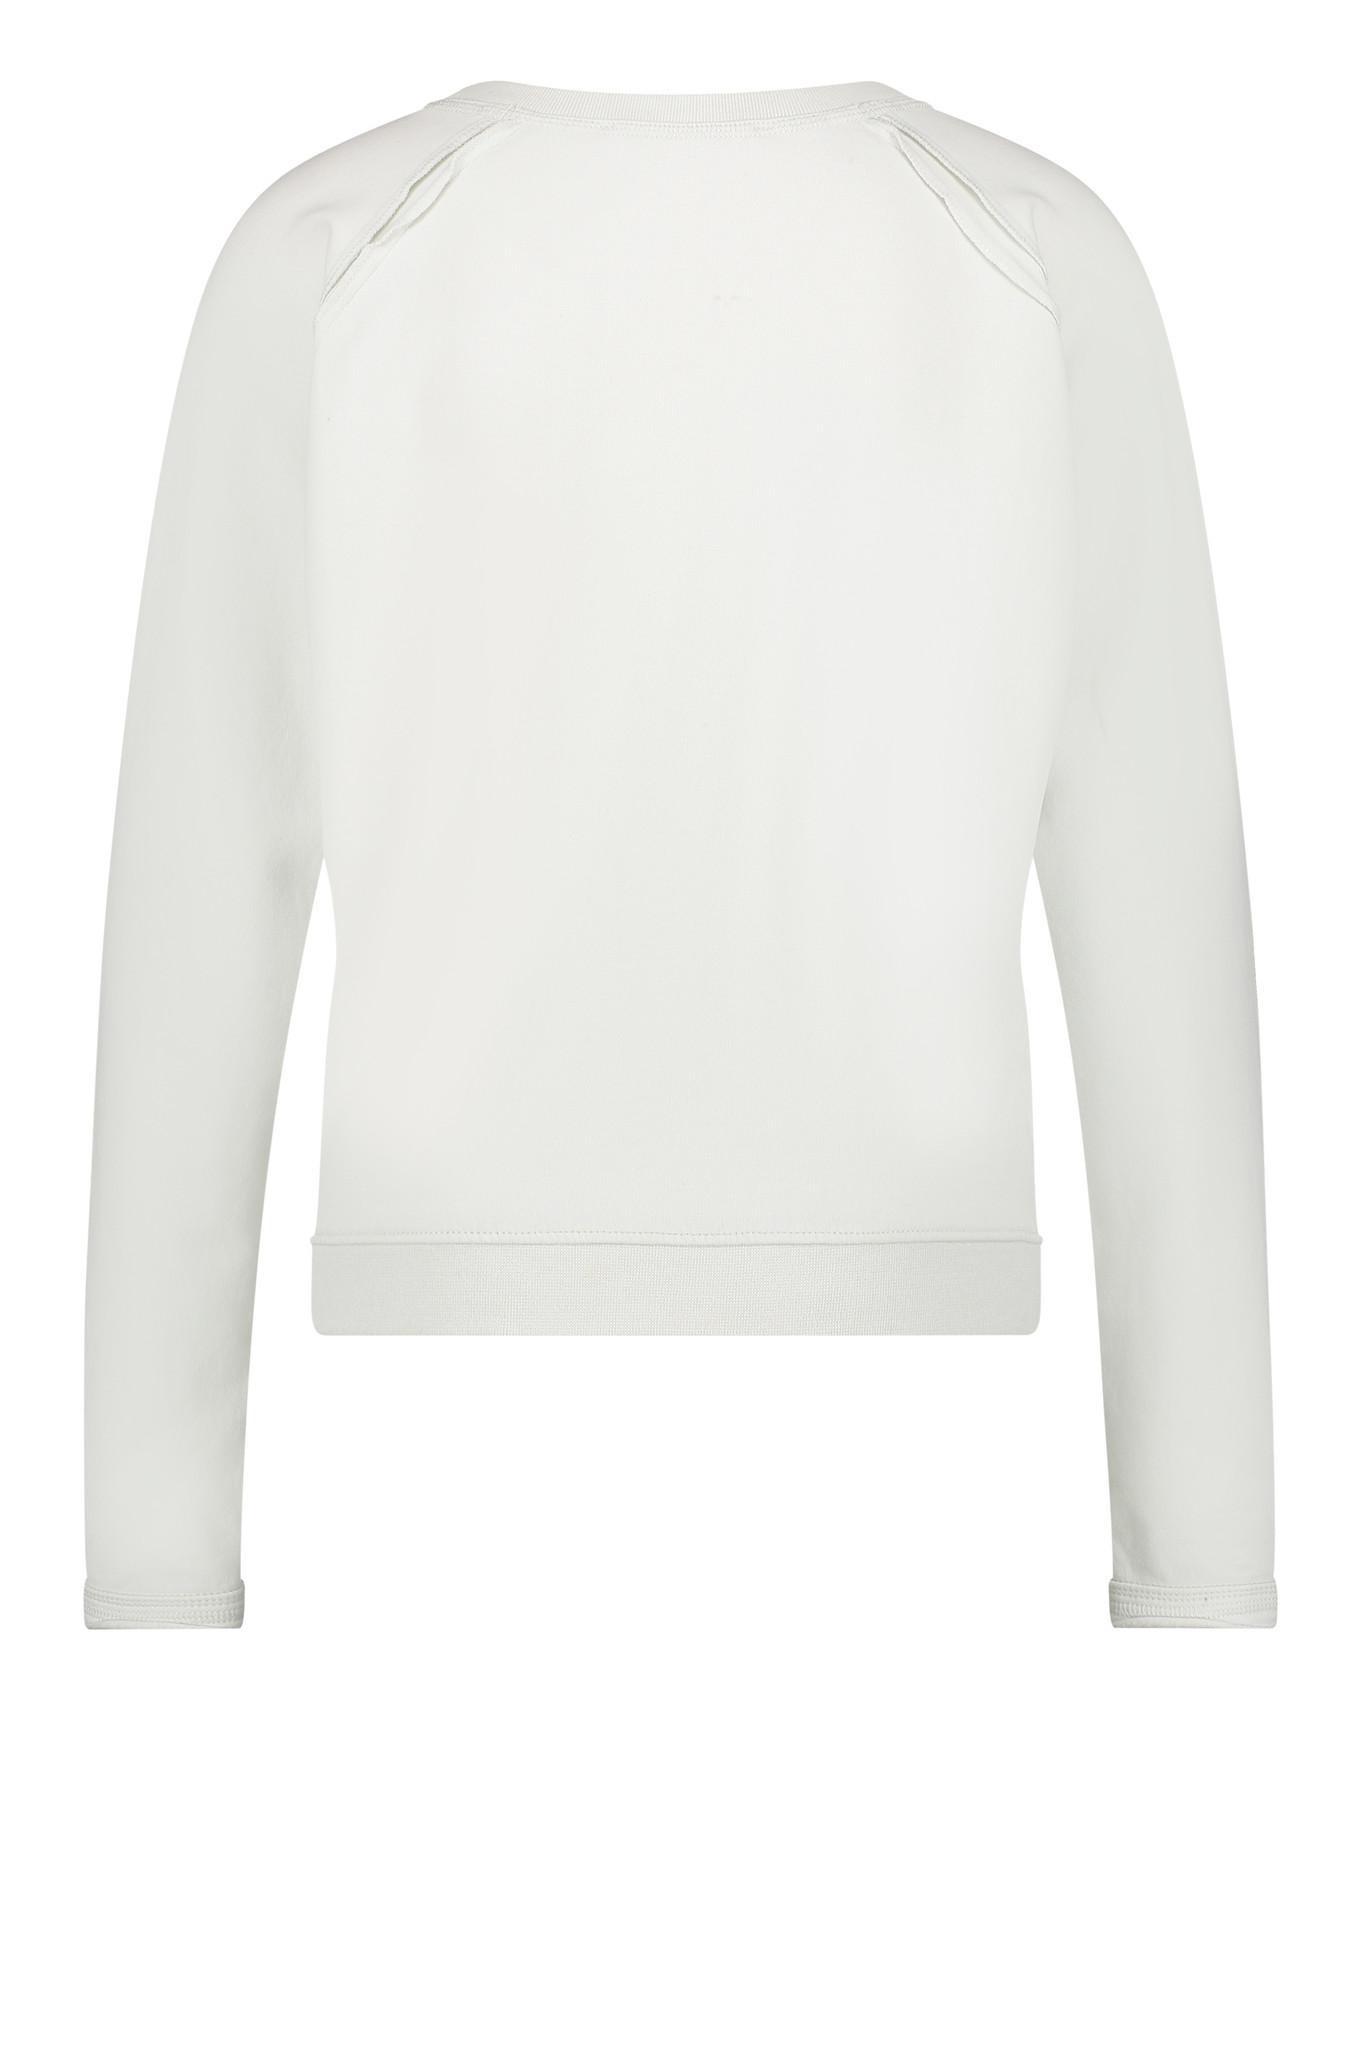 Penn & Ink Sweater S21F872-2